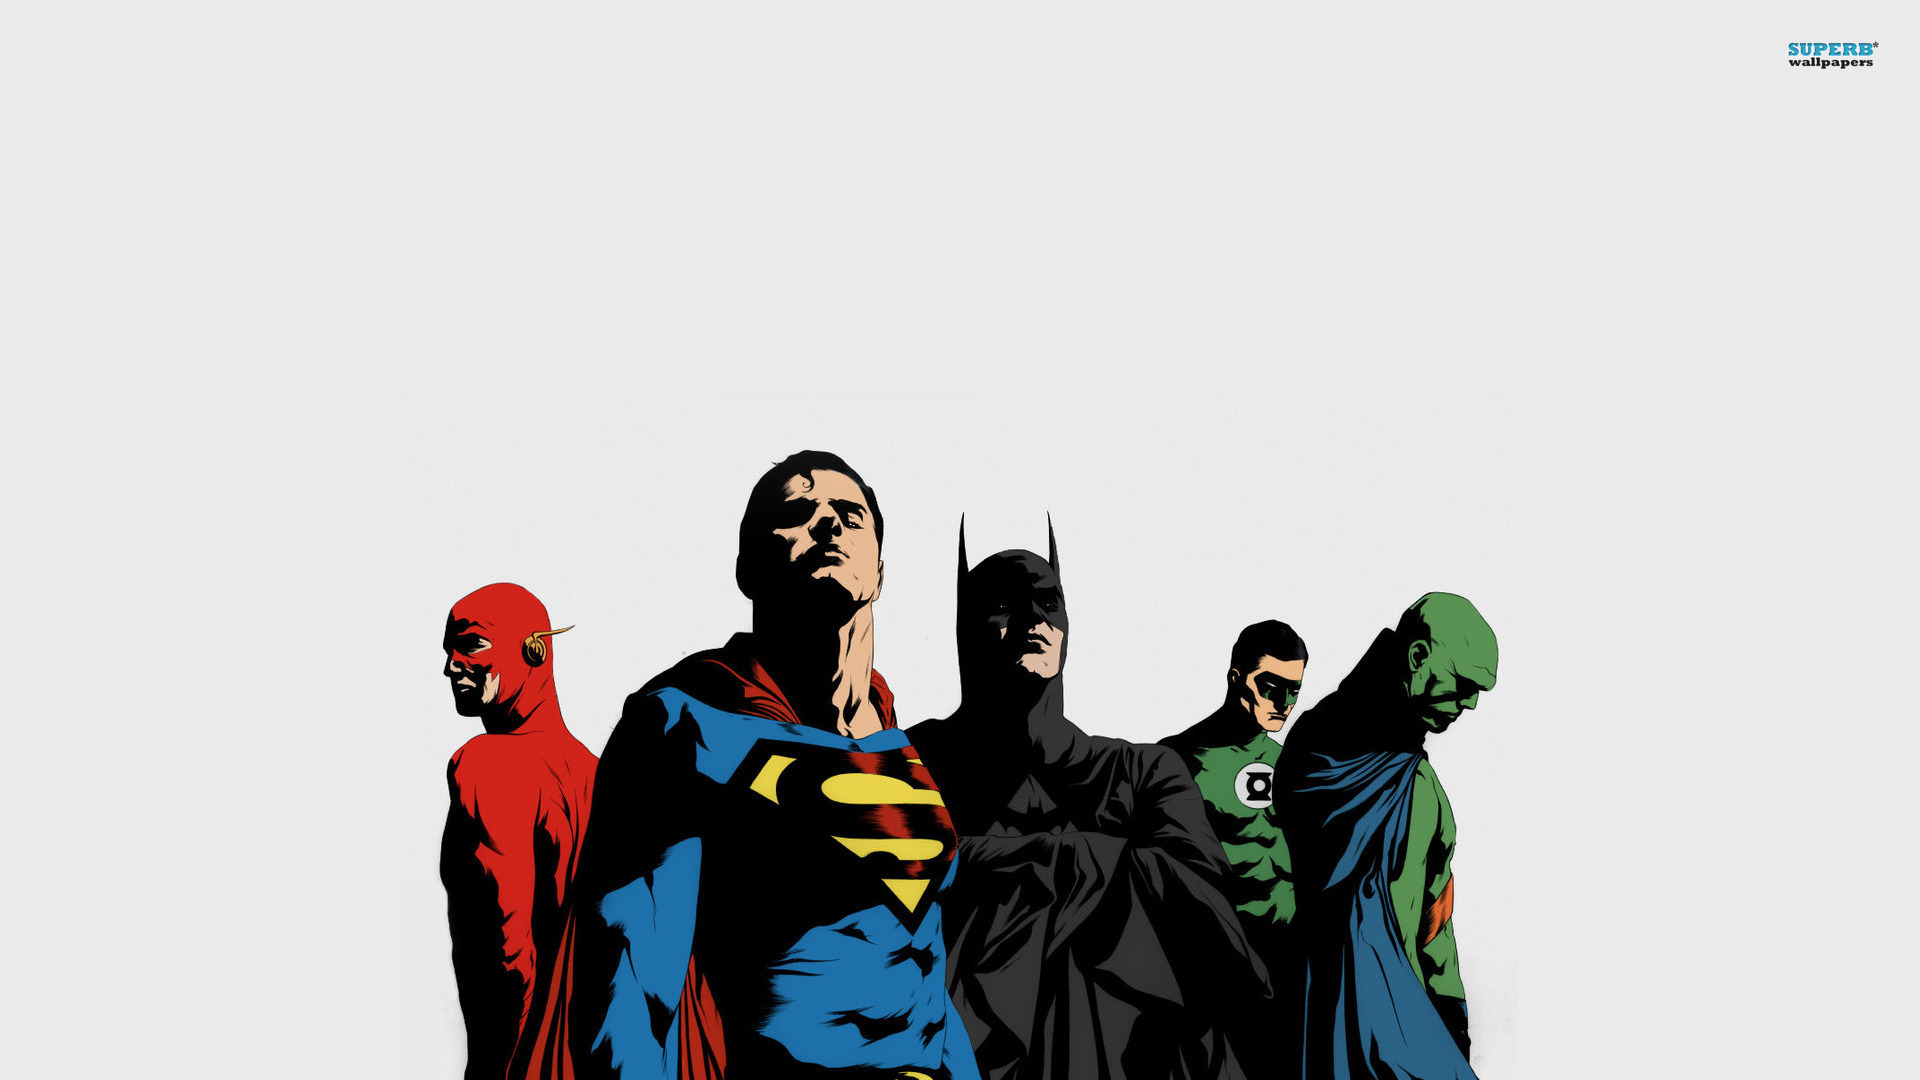 Hd wallpaper justice league - Justice League